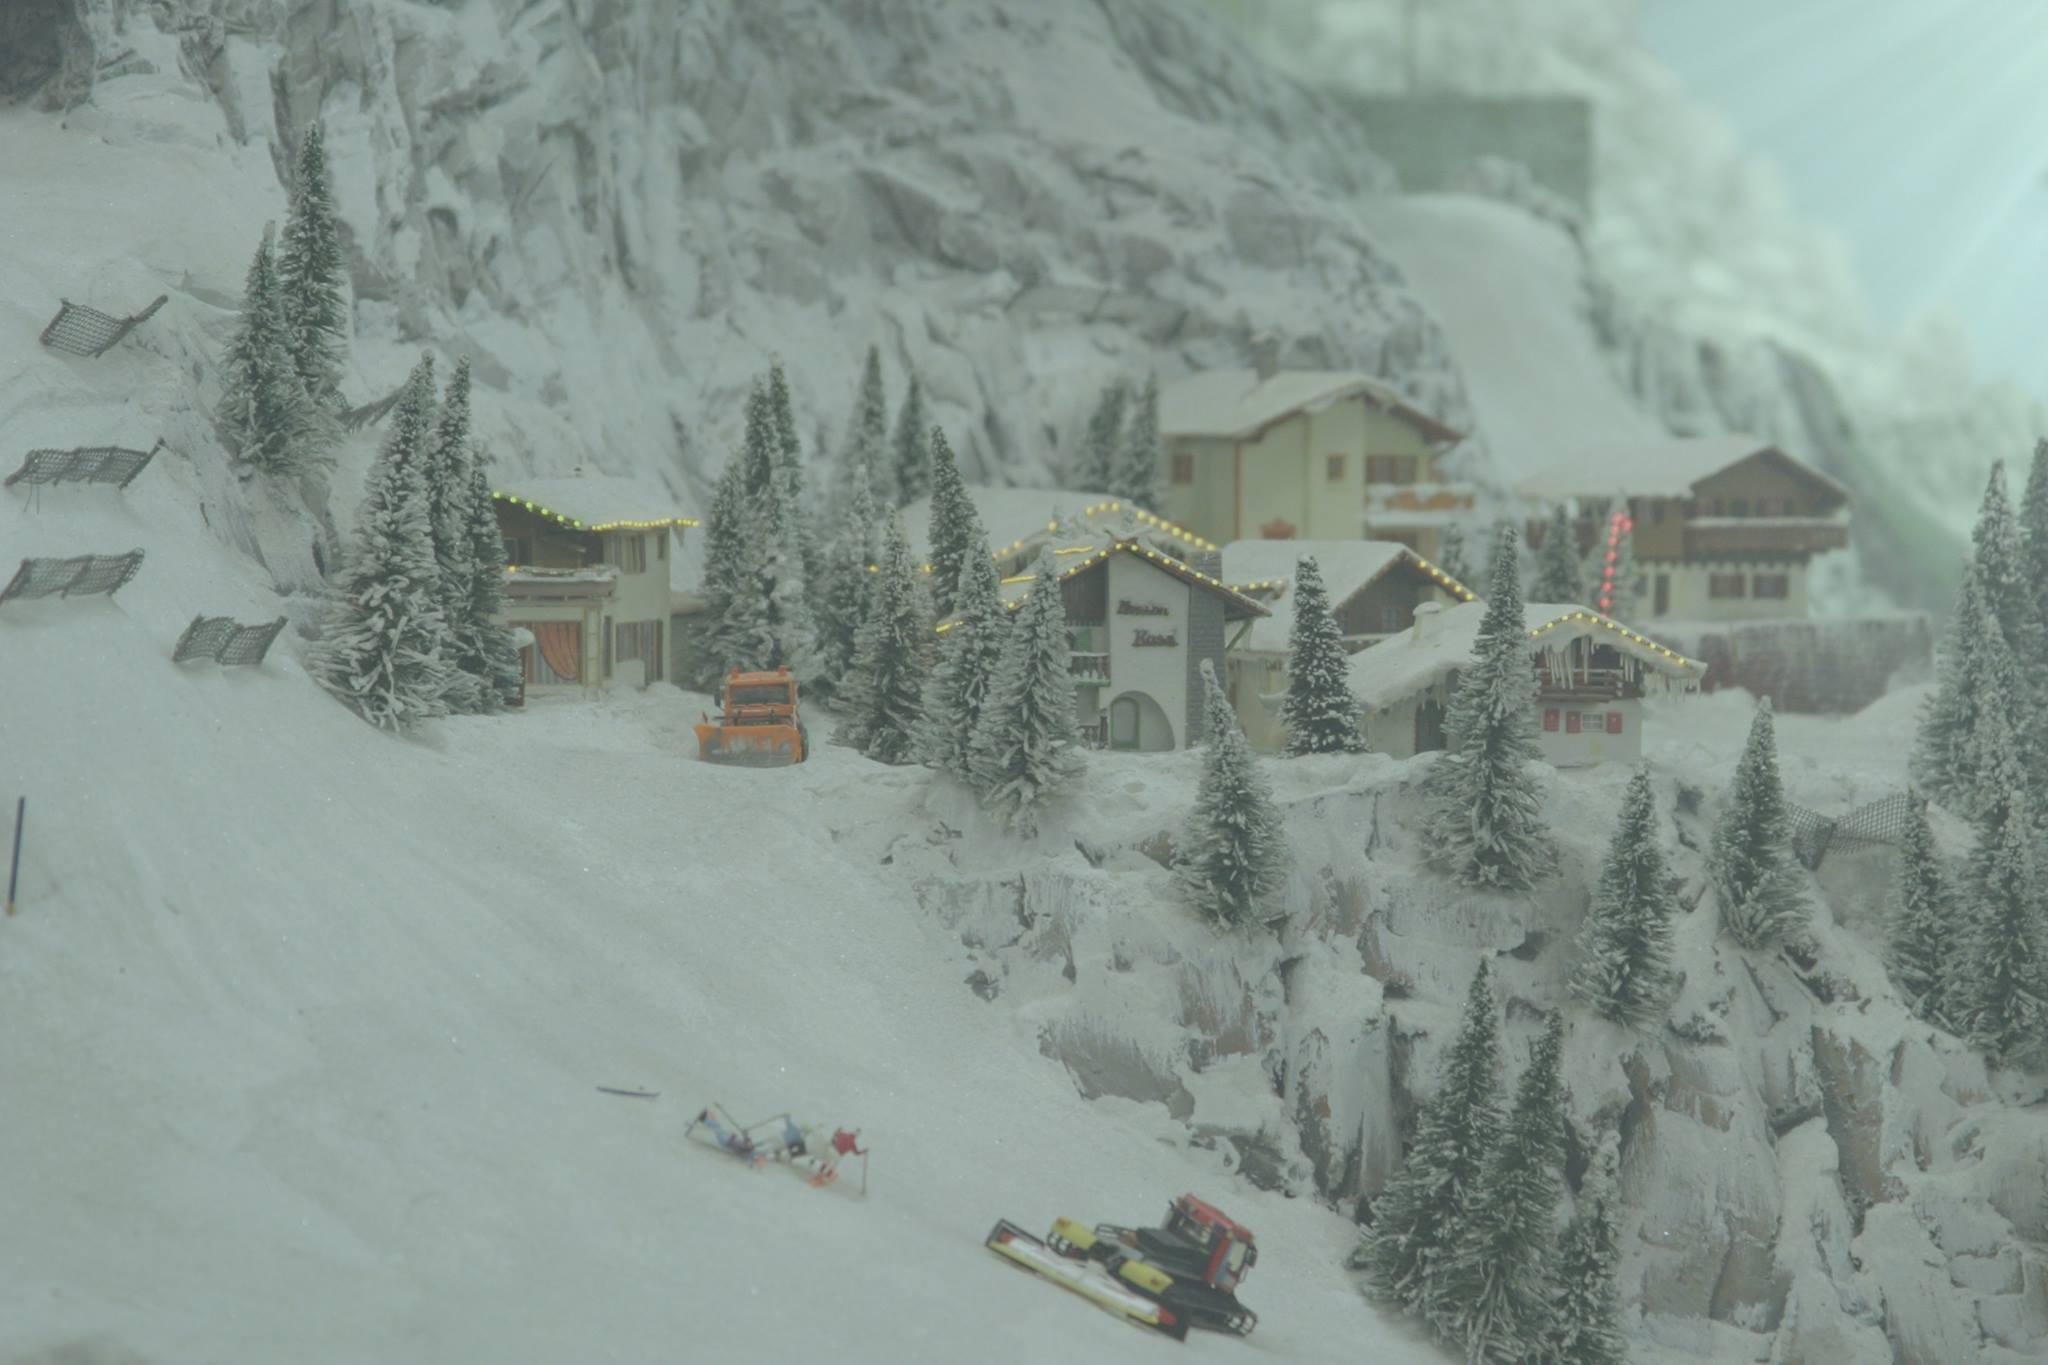 schnee fotografieren